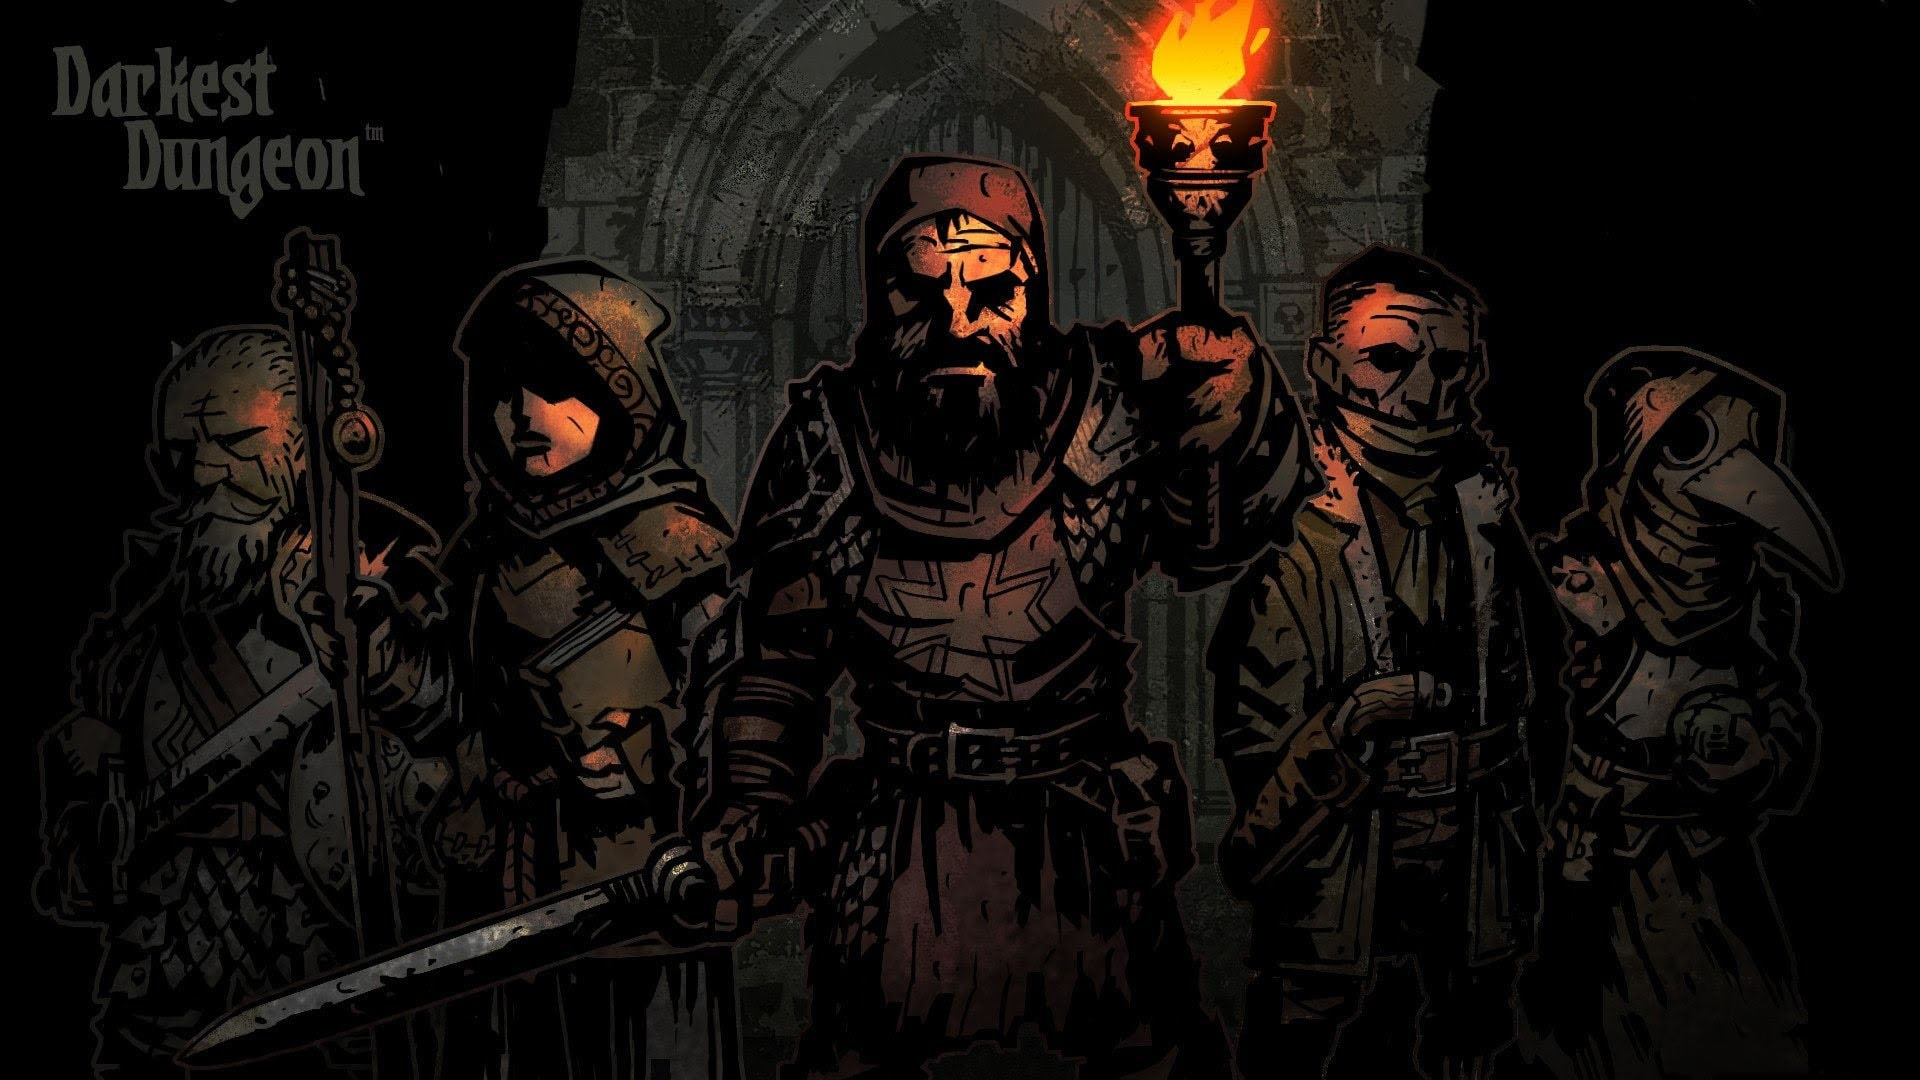 Darkest Dungeon Full hd wallpapers